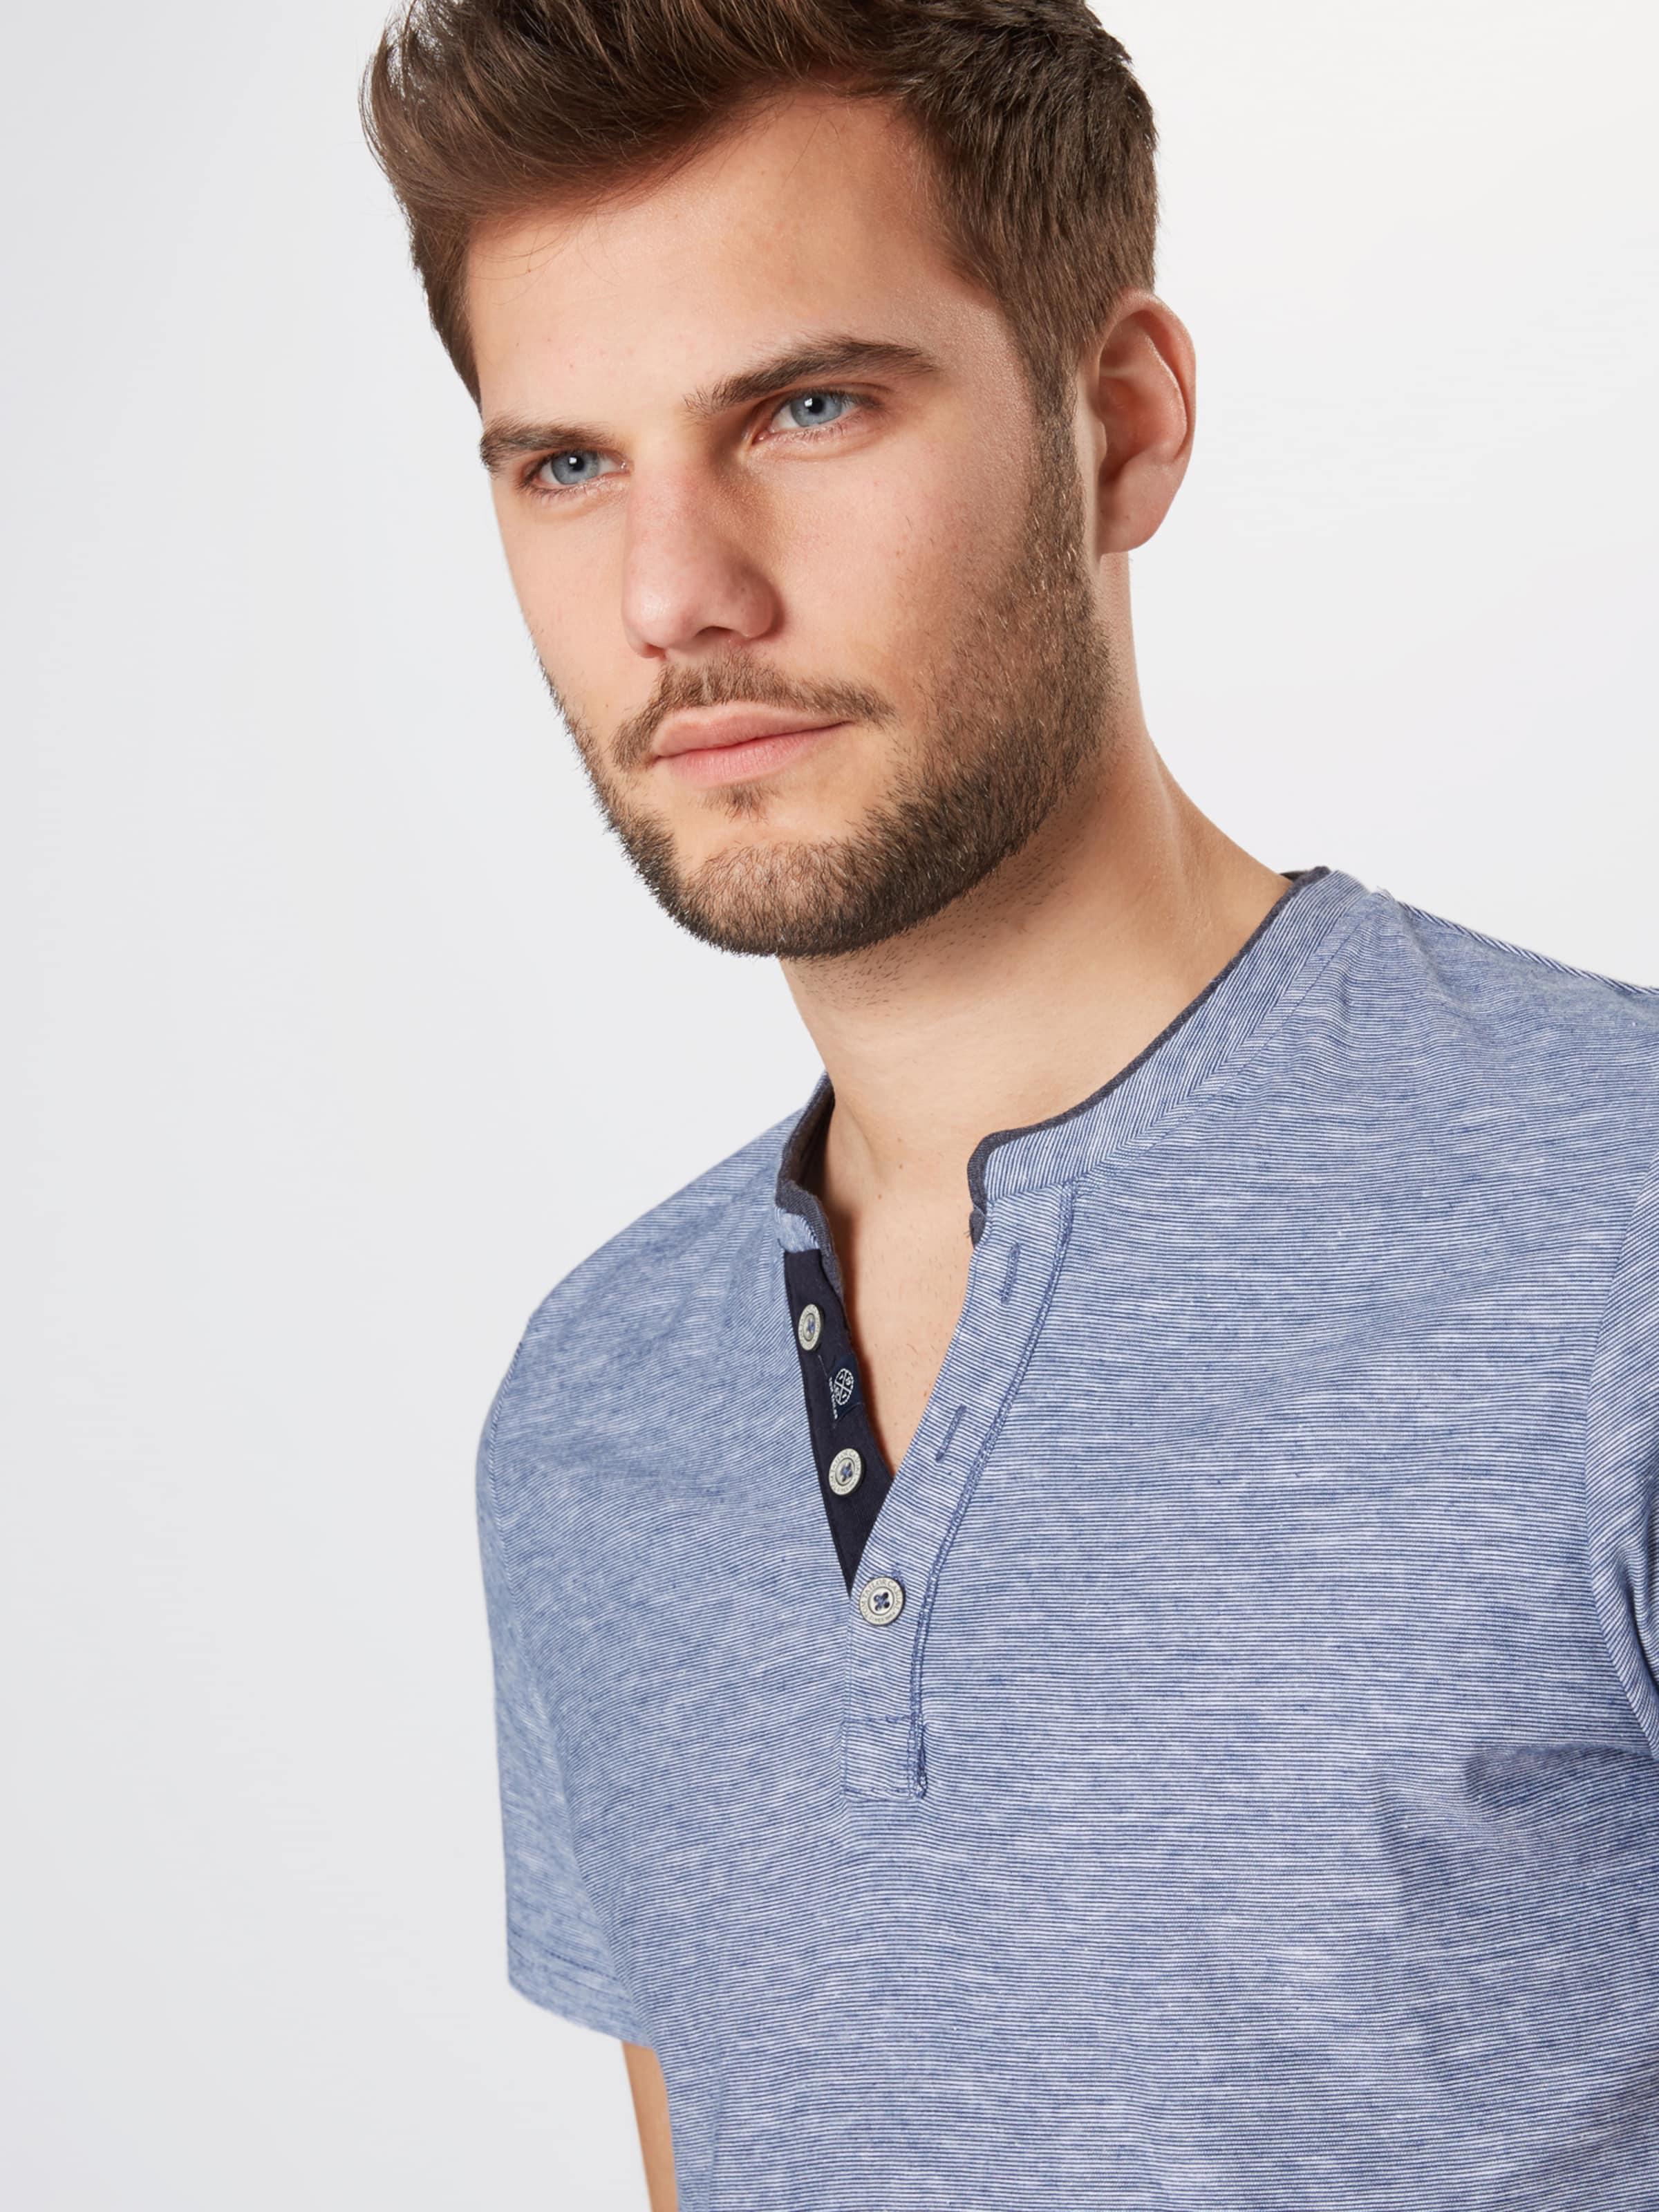 Tailor Bleu Tom Fumé shirt En T 5j3RqLcS4A